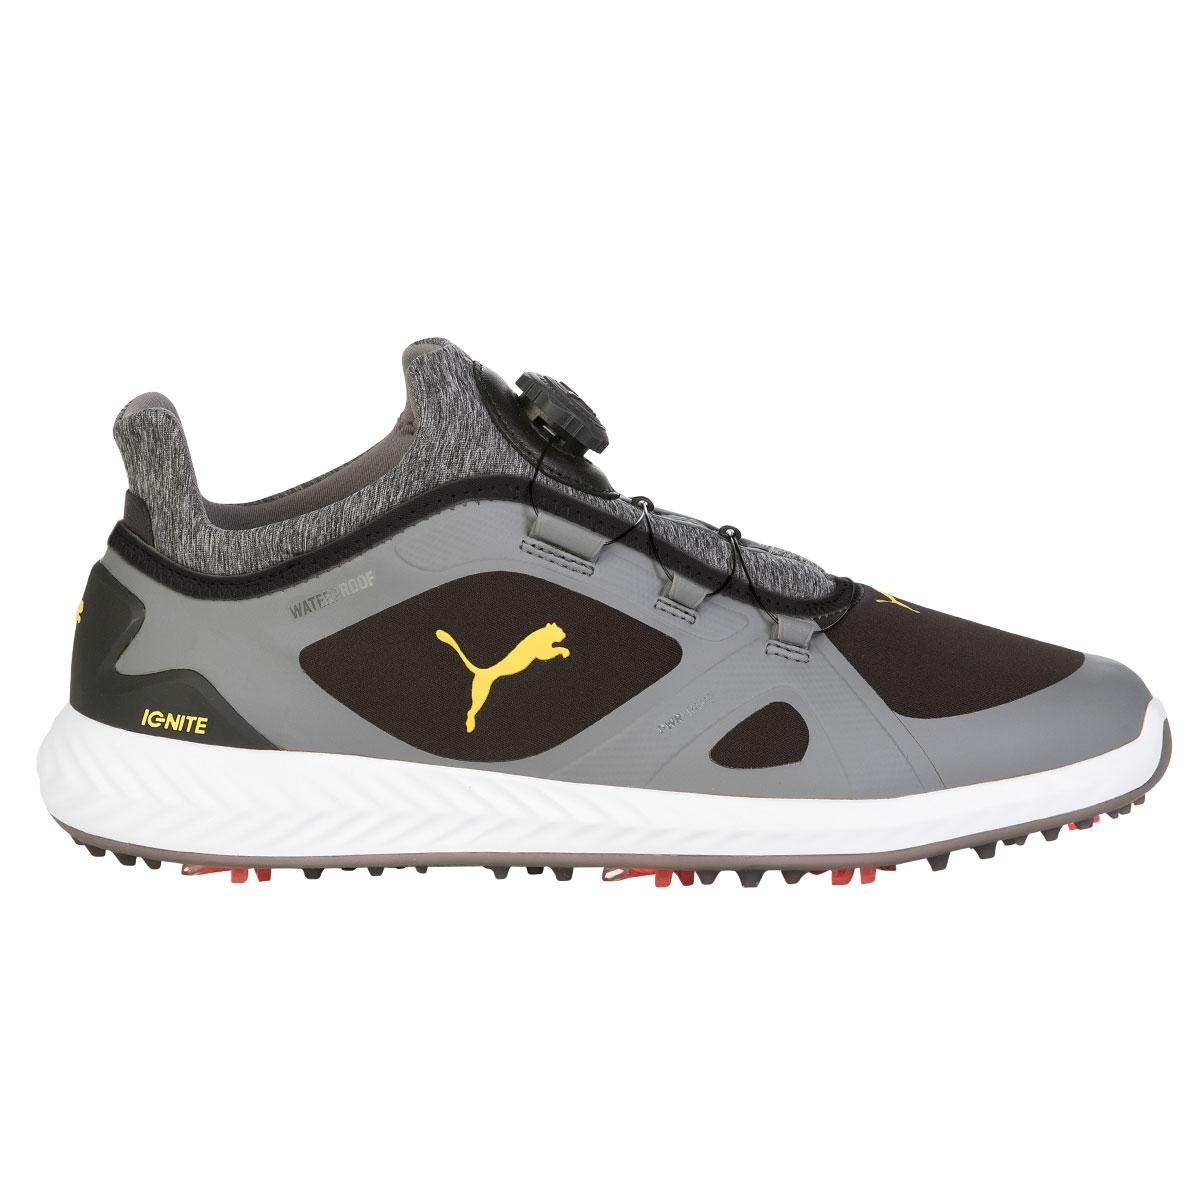 PUMA Golf IGNITE PWRADAPT DISC Shoes